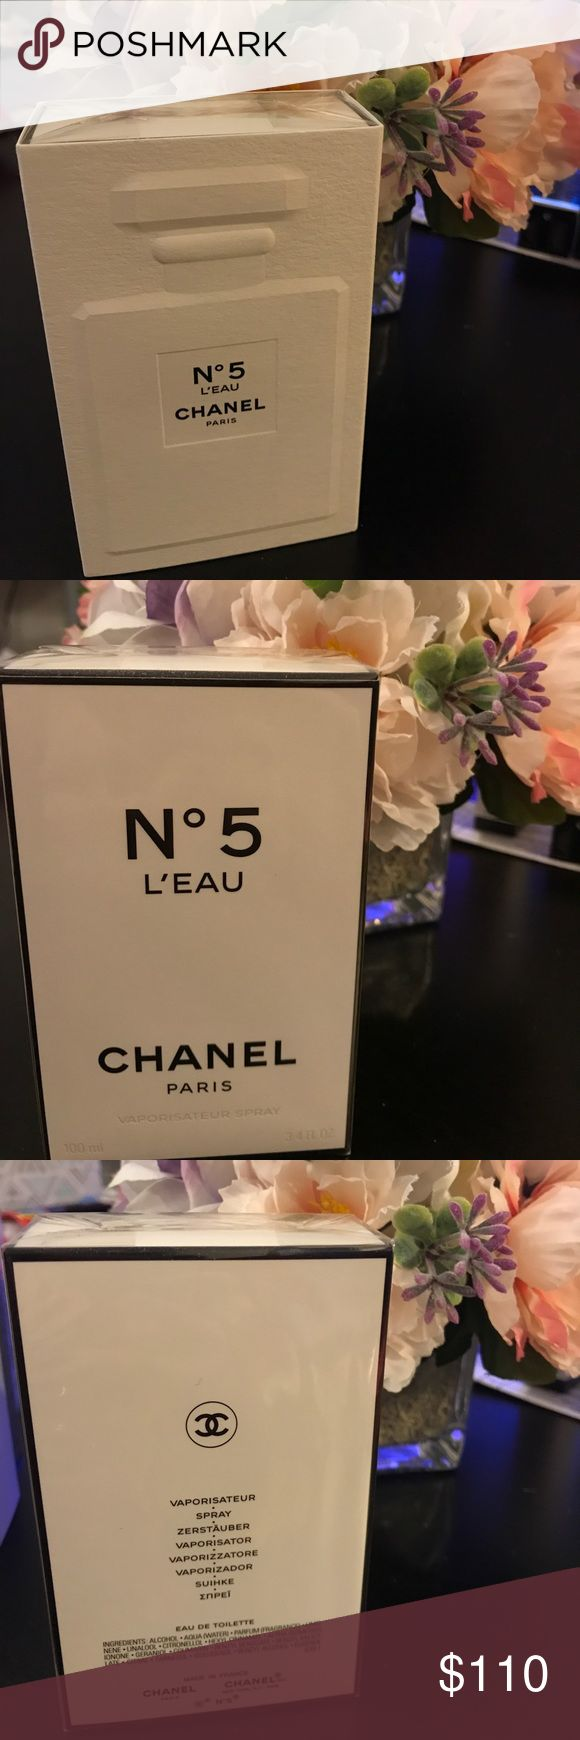 Chanel N5 l'eau Vaporisateur Spray EDT 3.4 FL OZ BRAND NEW. Sealed. Chanel N5 l'eau Vaporisateur EDT Spray 3.4 FL OZ 100ml CHANEL Makeup